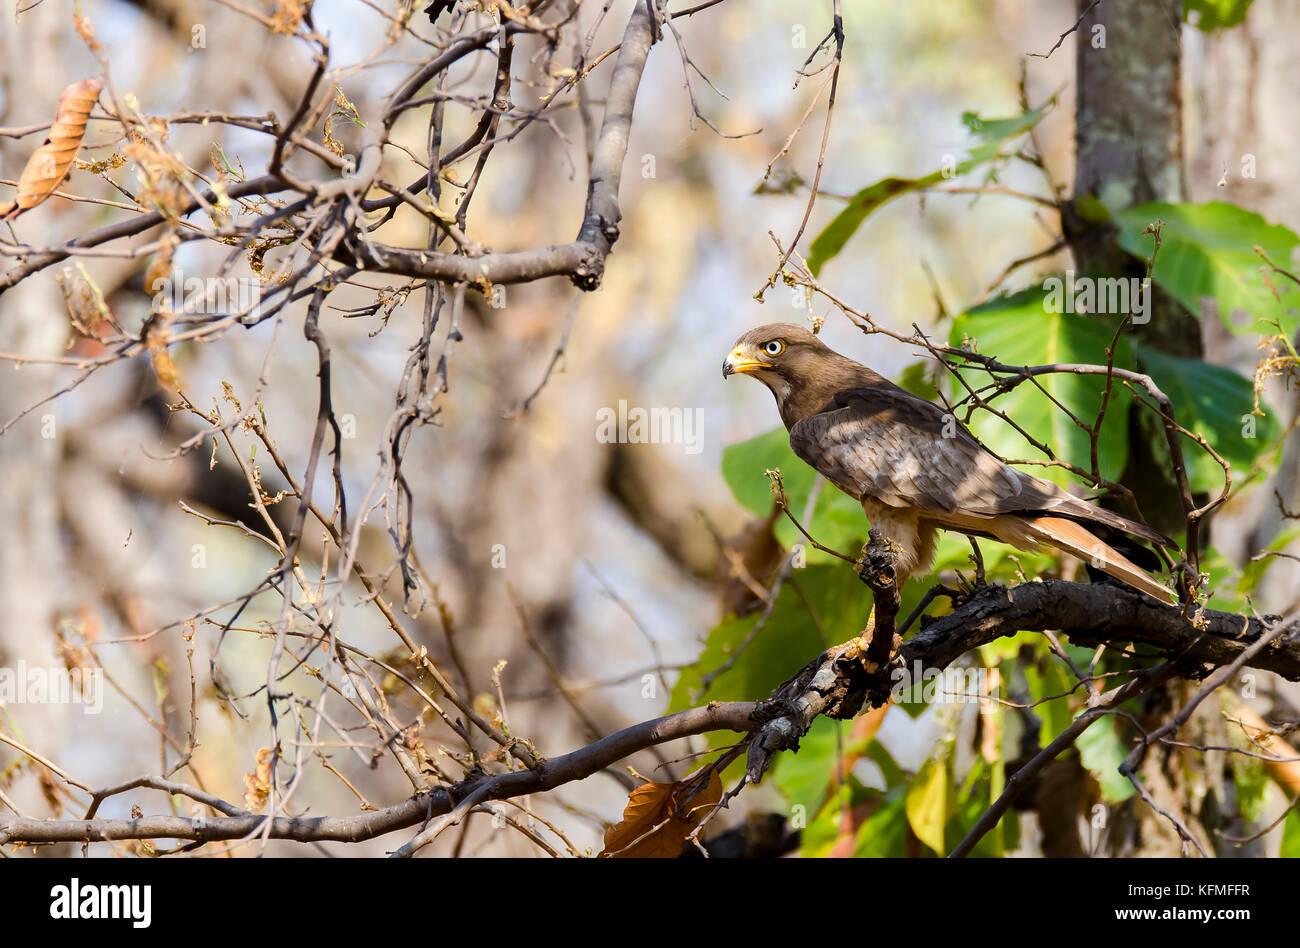 White-eyed Buzzard sitting on a tree branch inside bandhavgarh national park during Indian safari - Stock Image